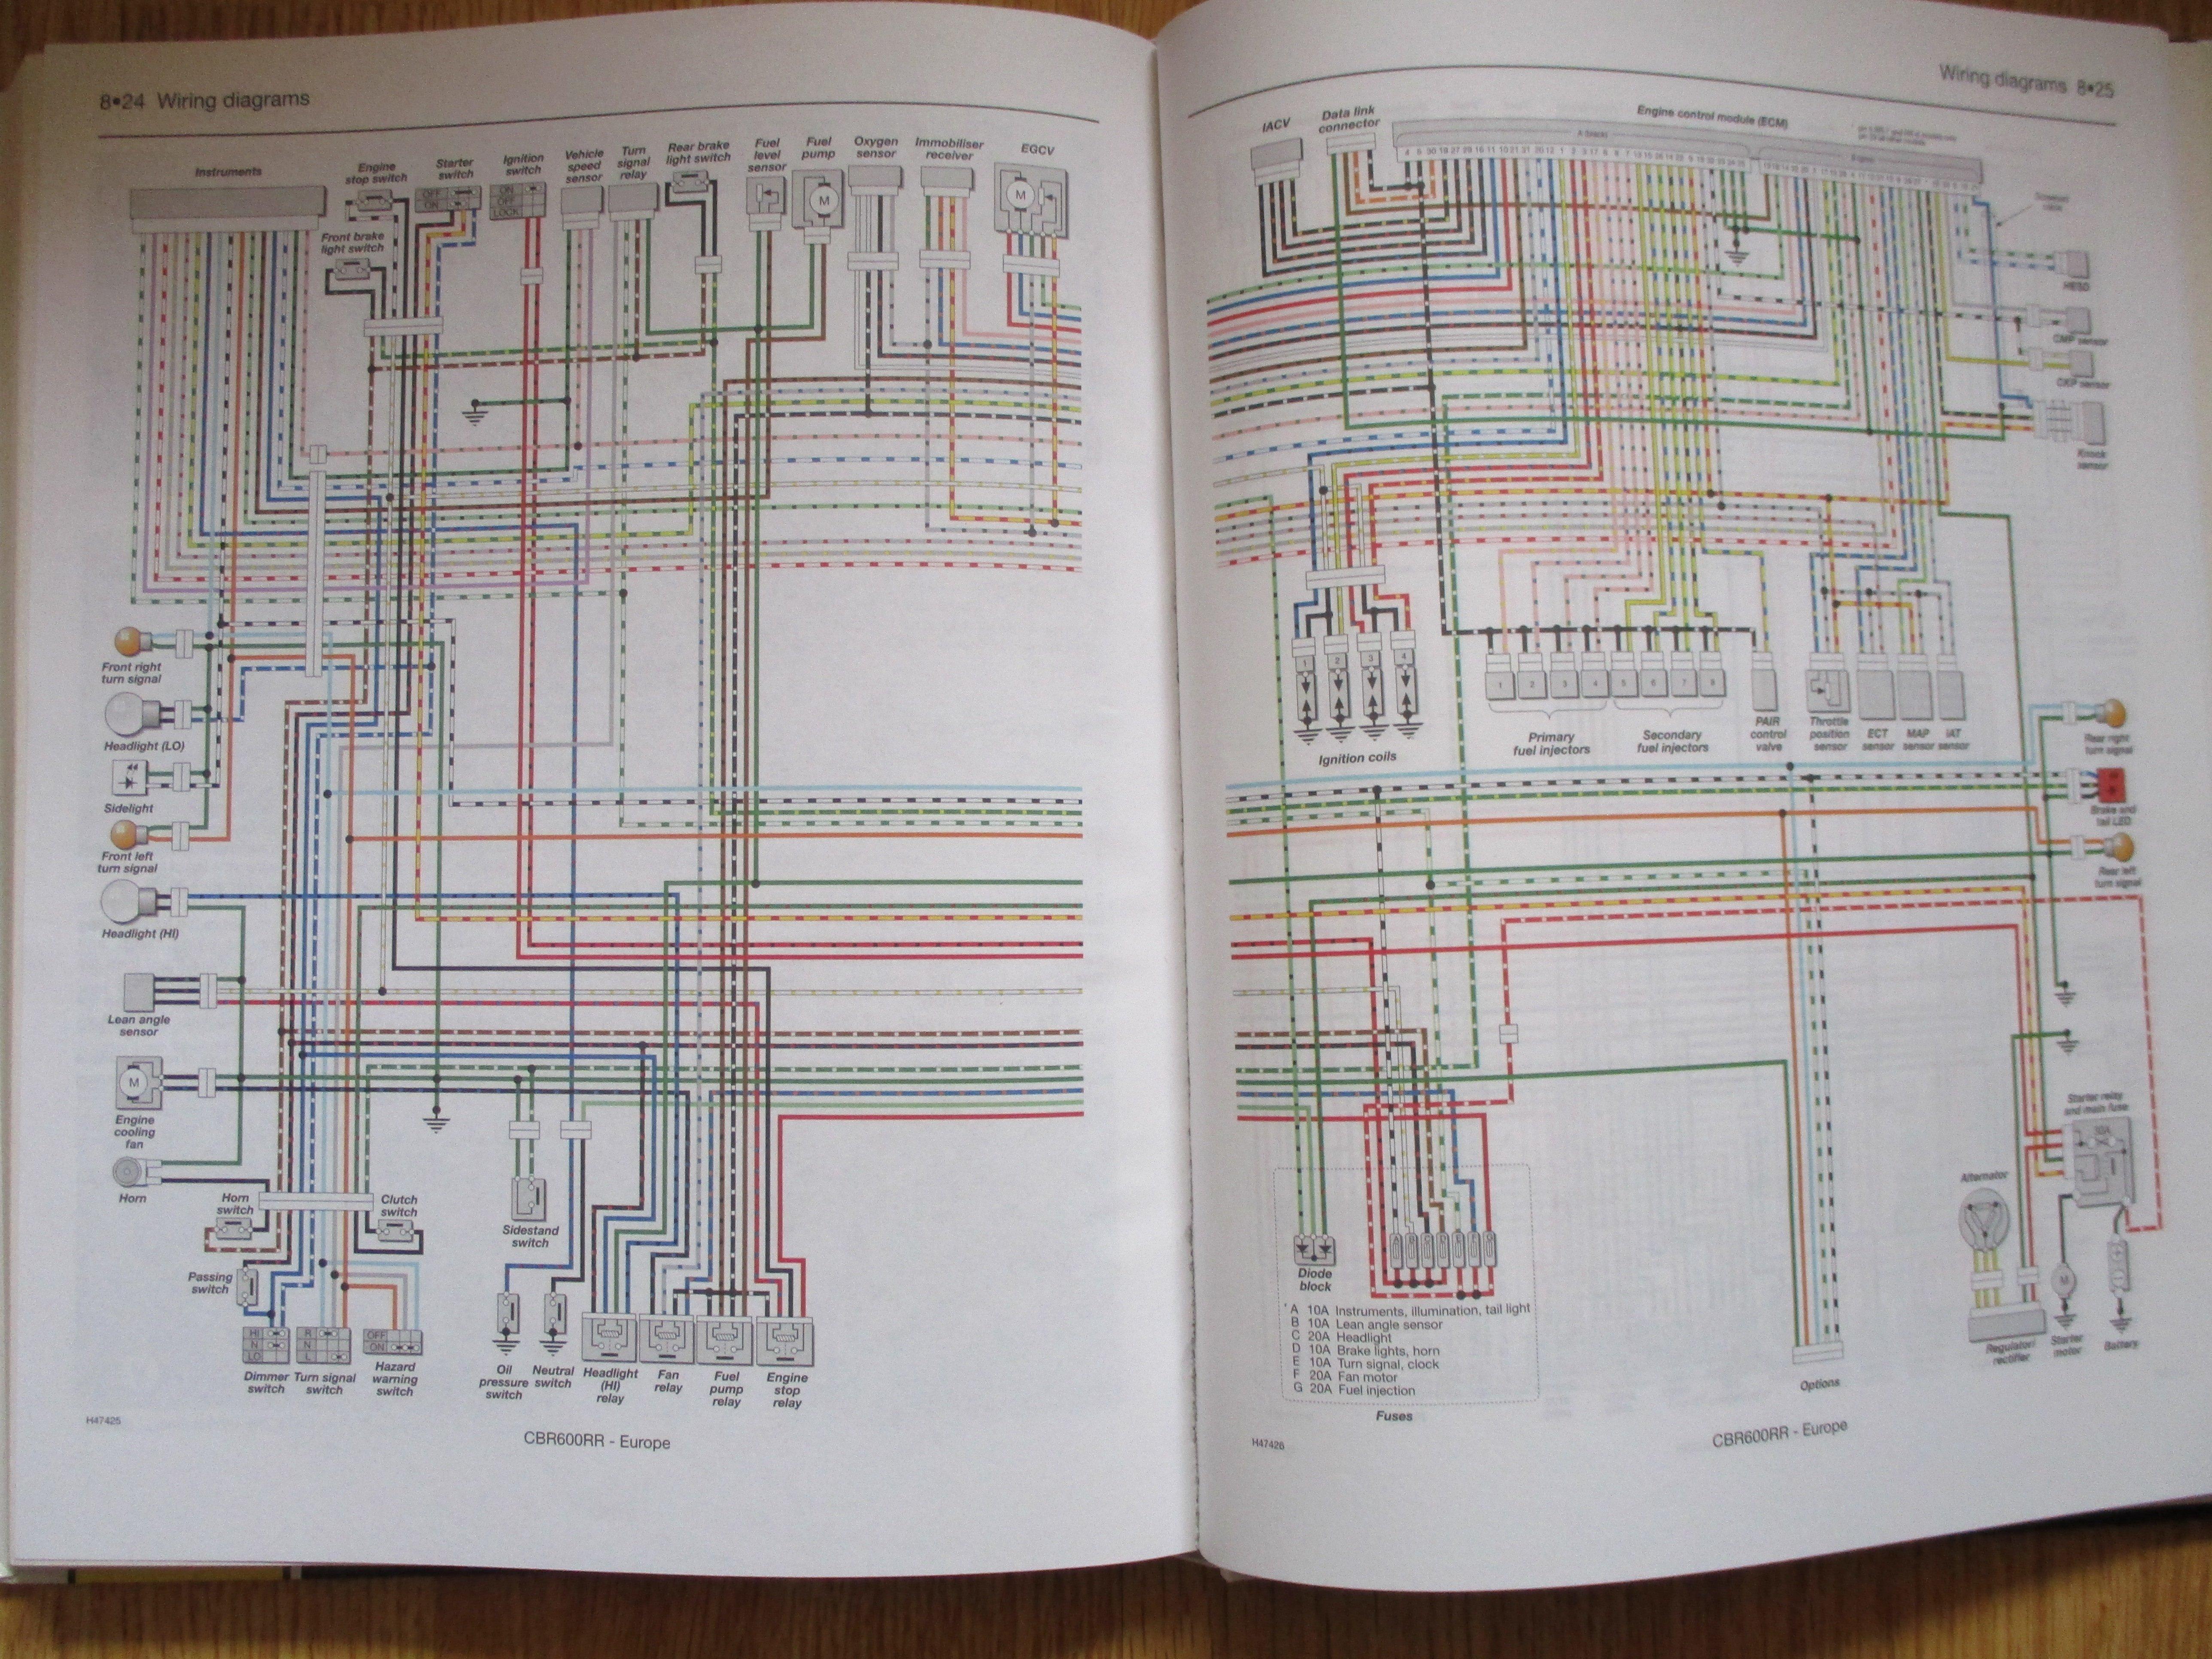 08 cbr600rr wiring diagram | honda cbr 600rr forum  honda cbr 600rr forum